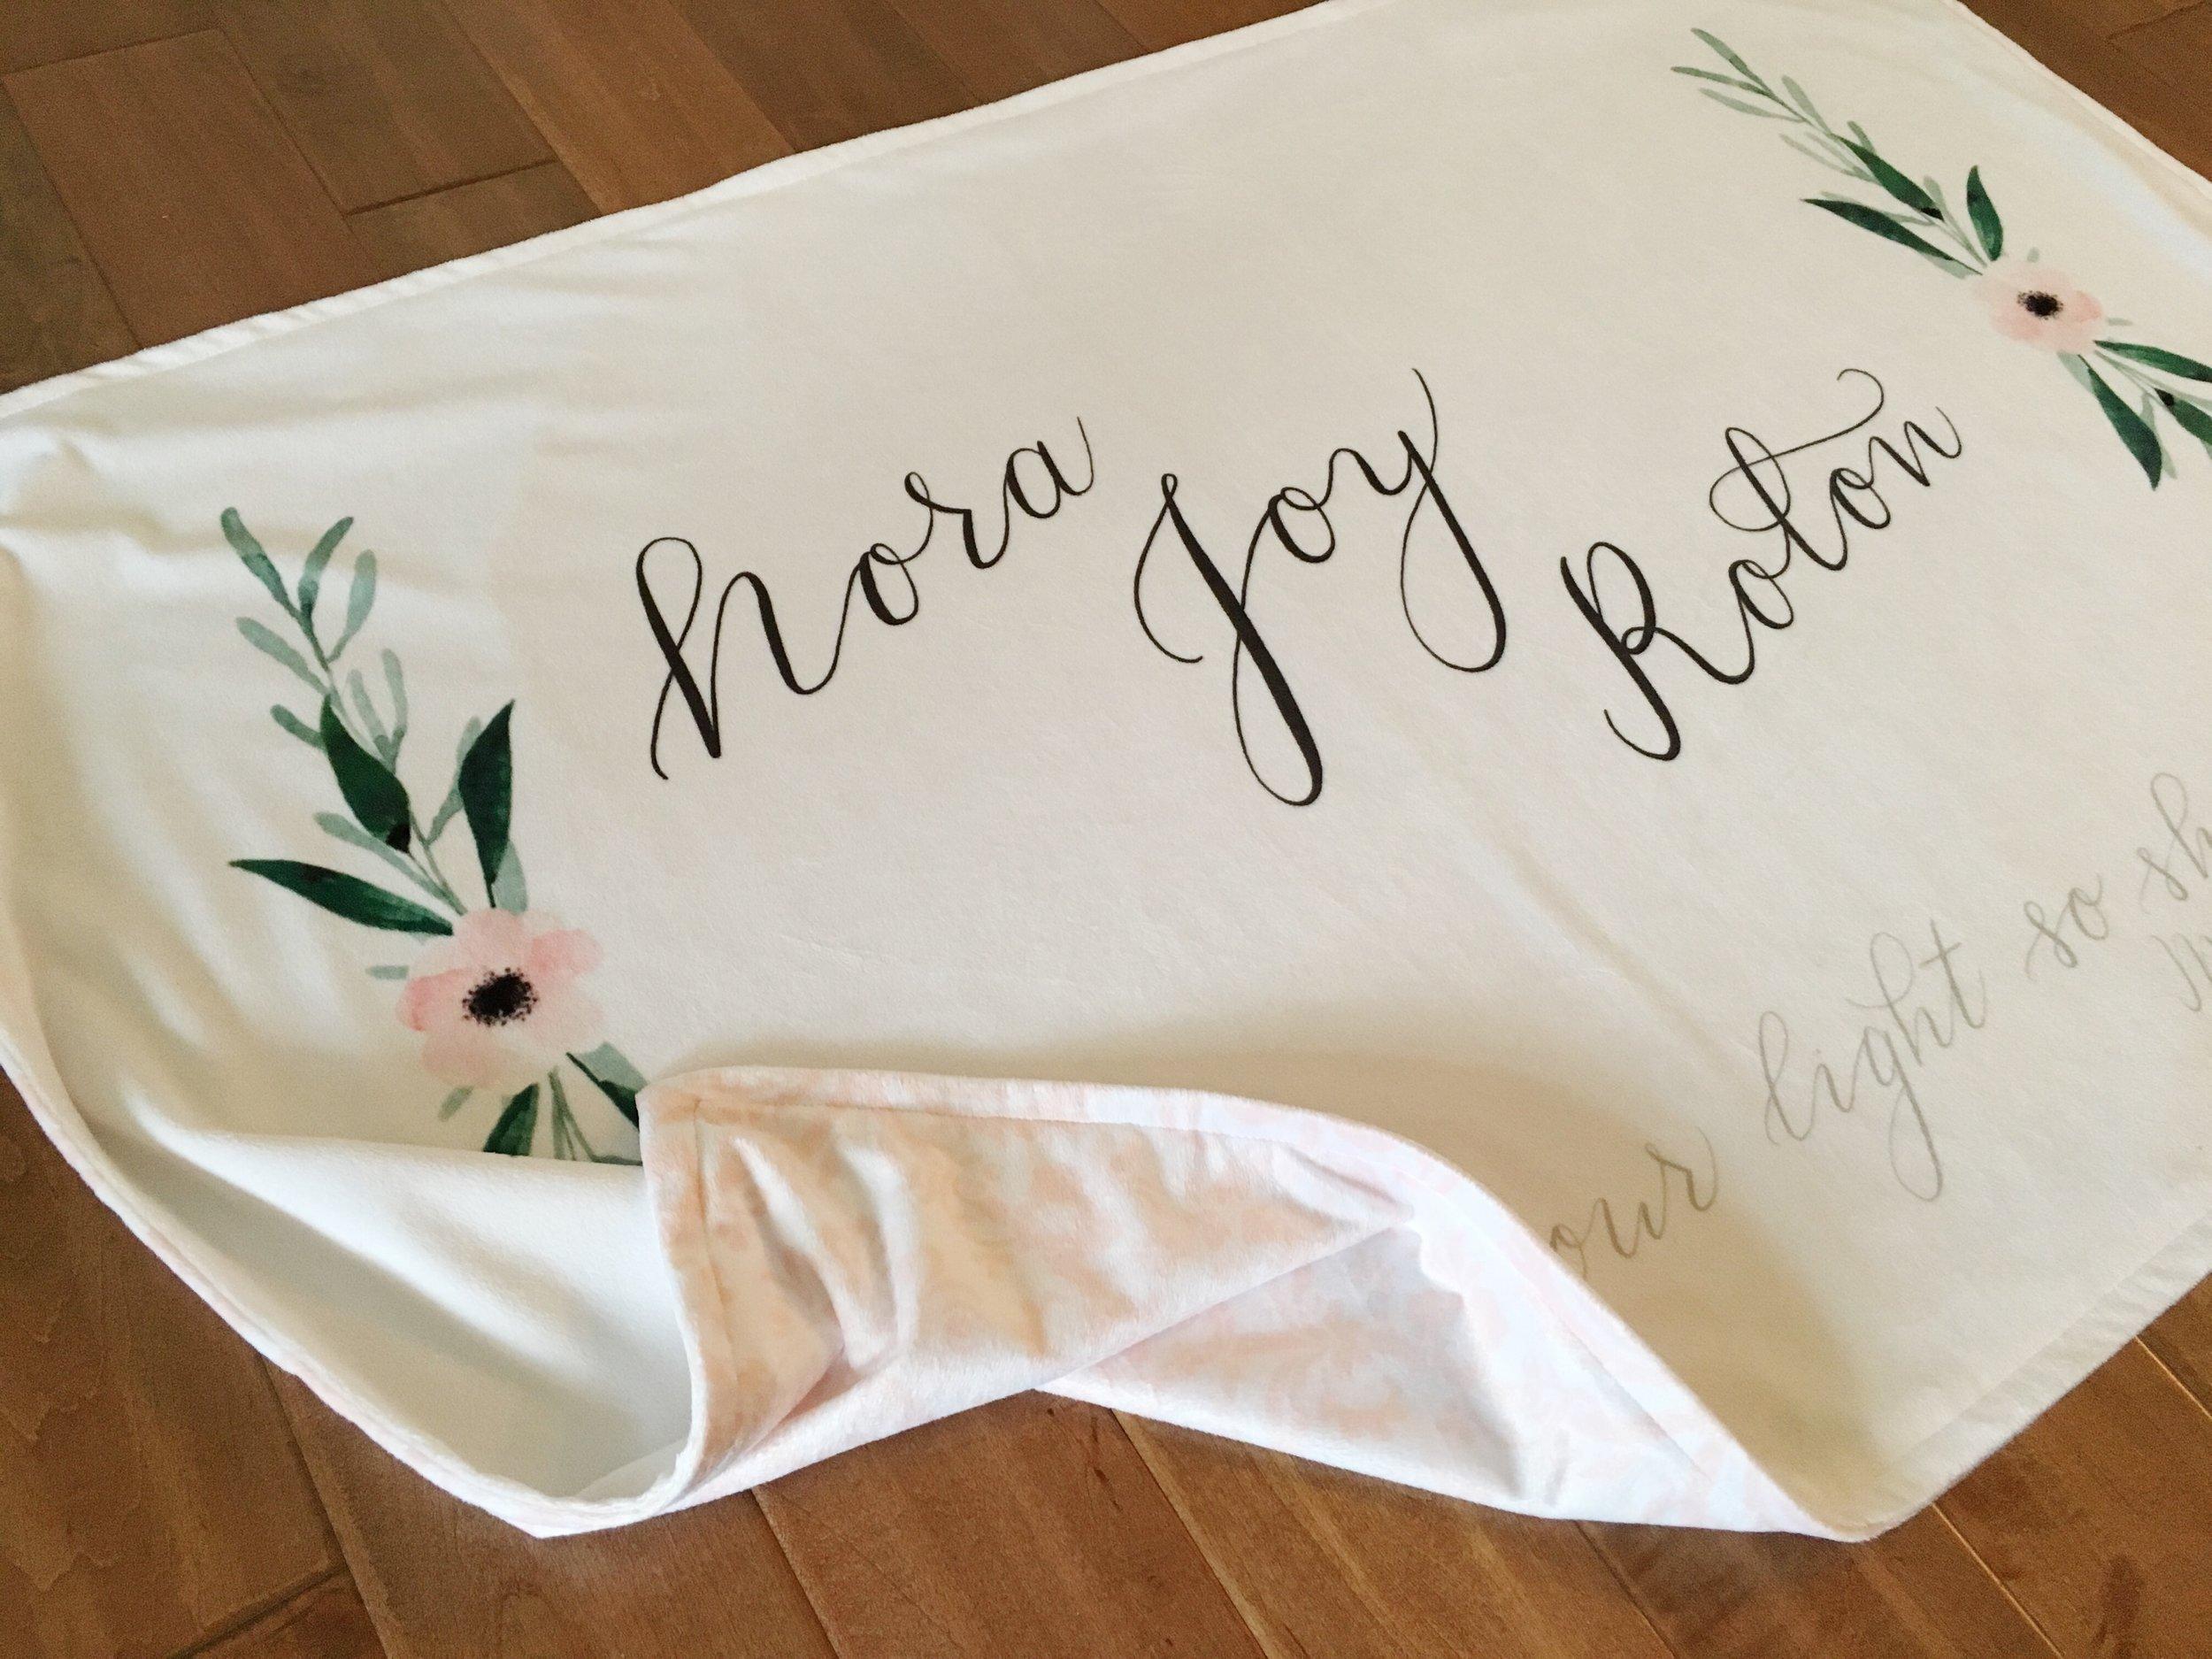 Central PA, Baby Blanket, Hand lettered, JesSmith Designs, Invitations, custom-04-03 17.12.06.jpg